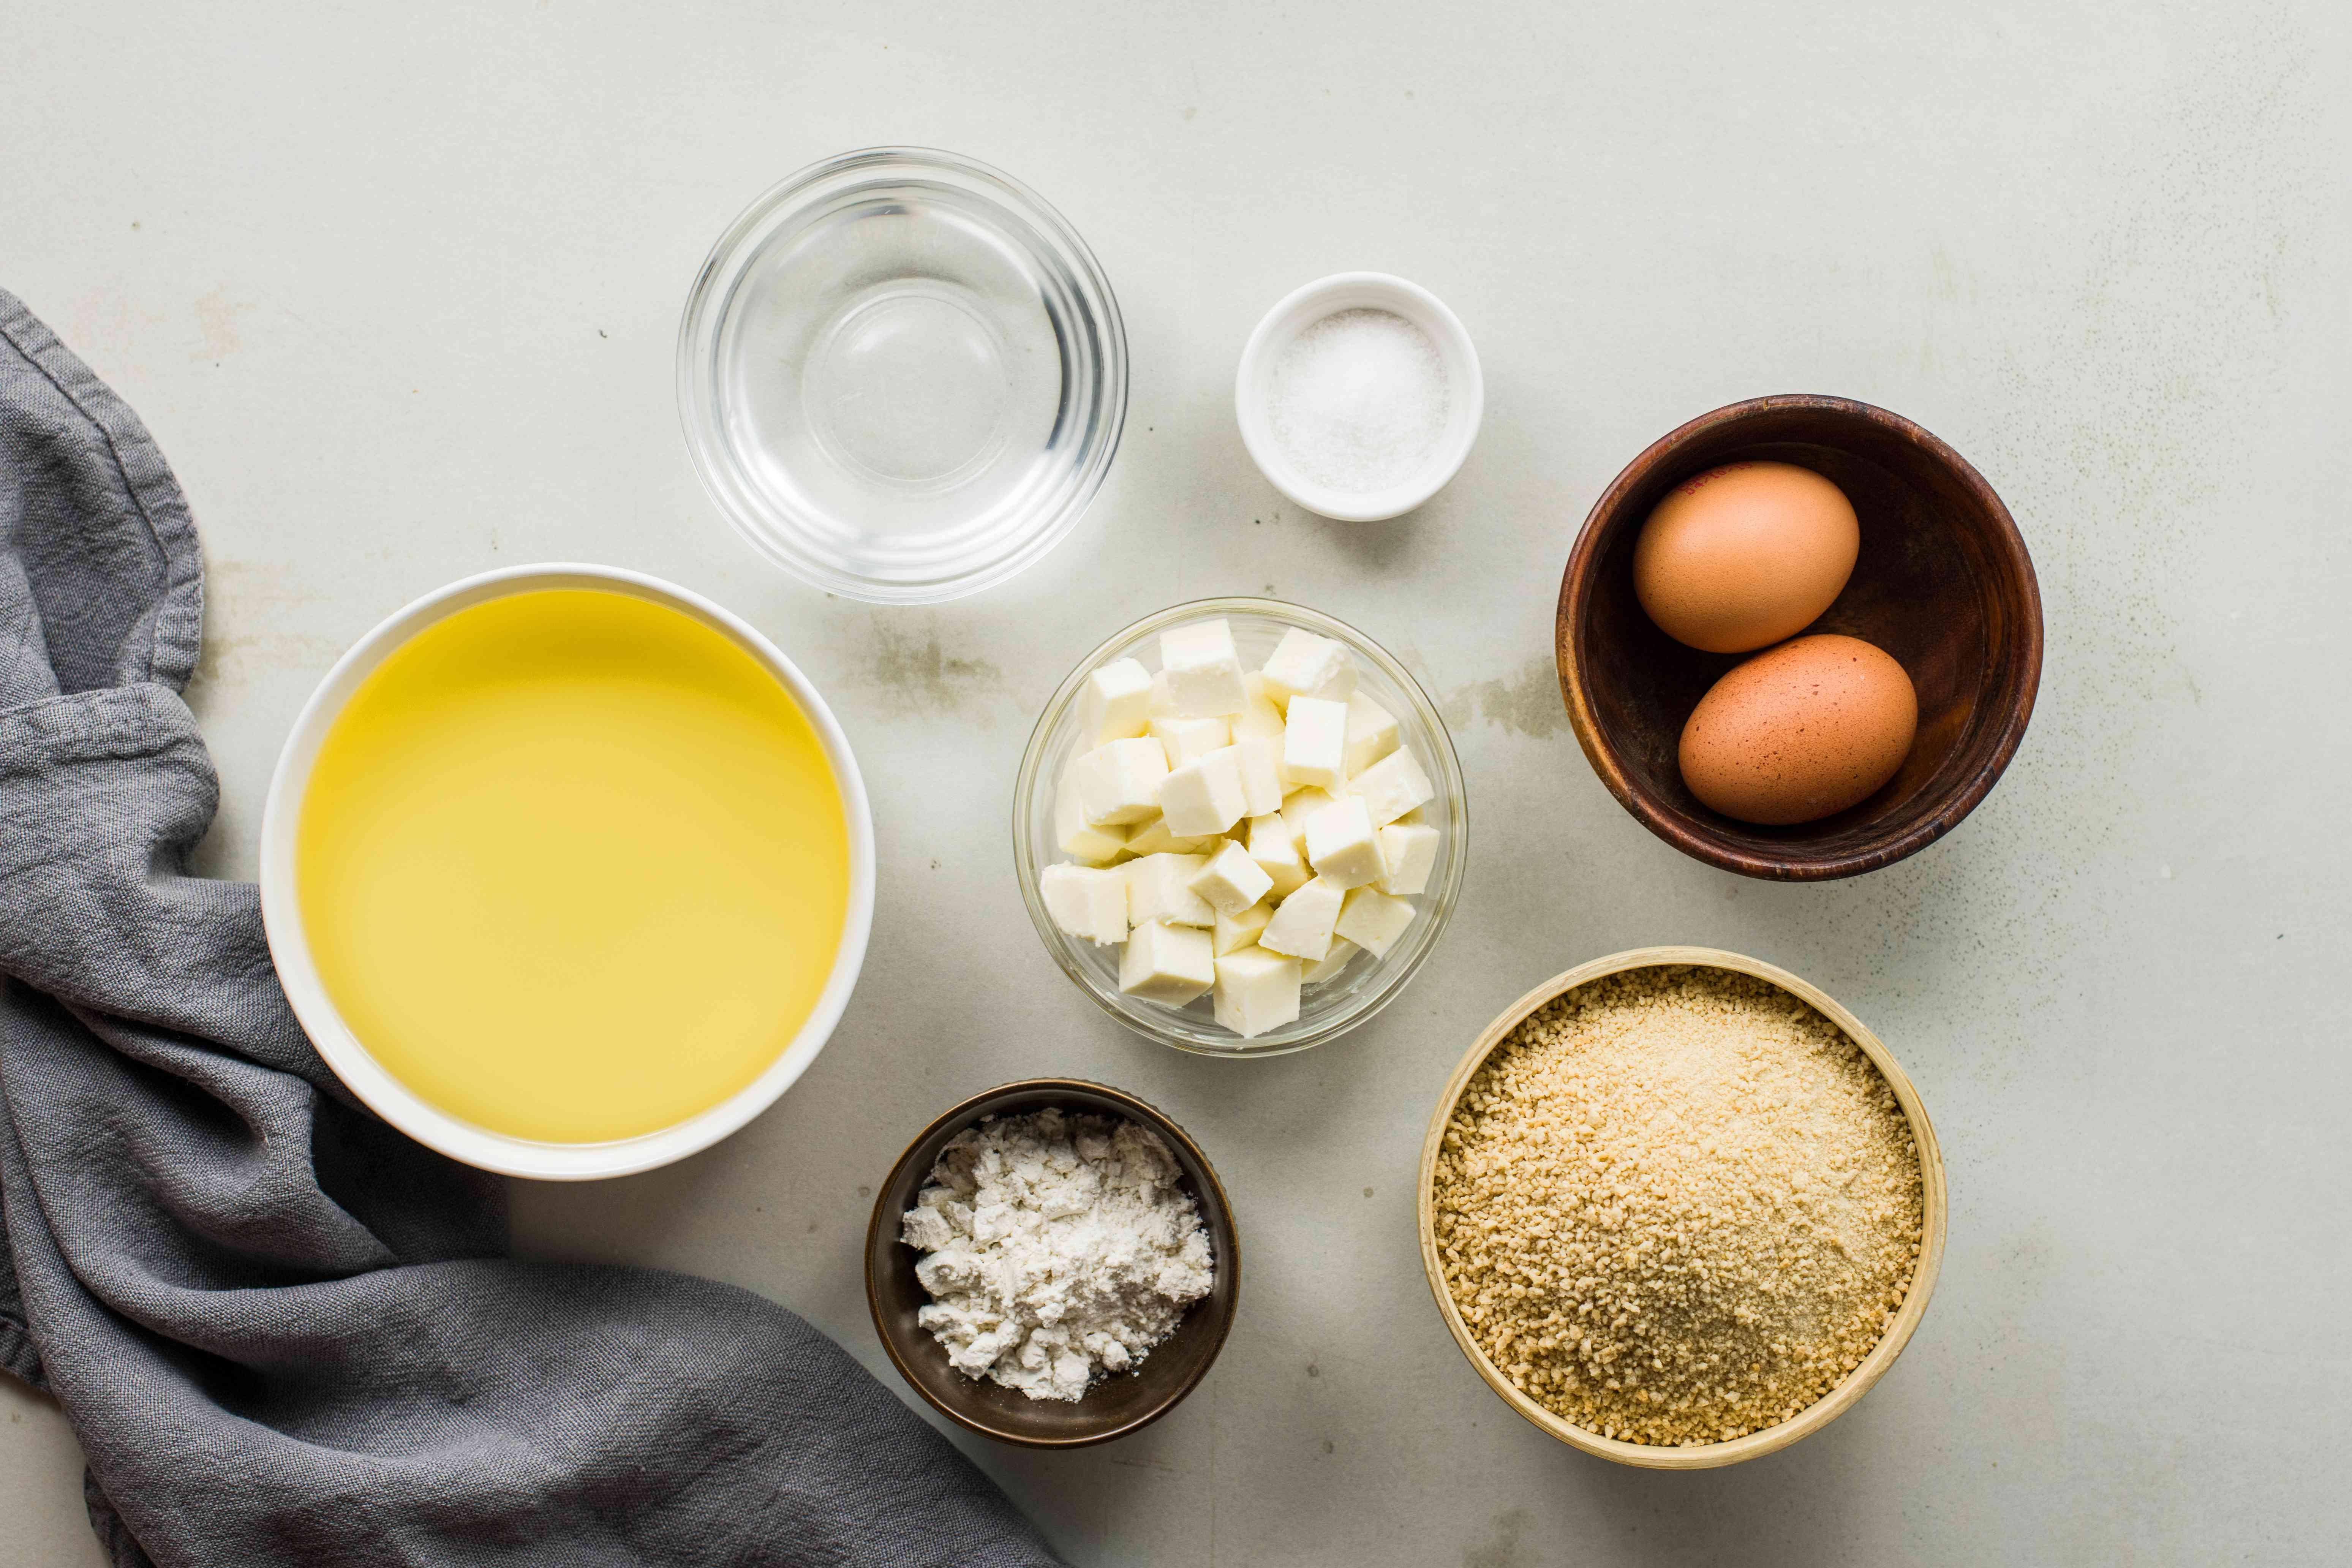 Ingredients for rice balls